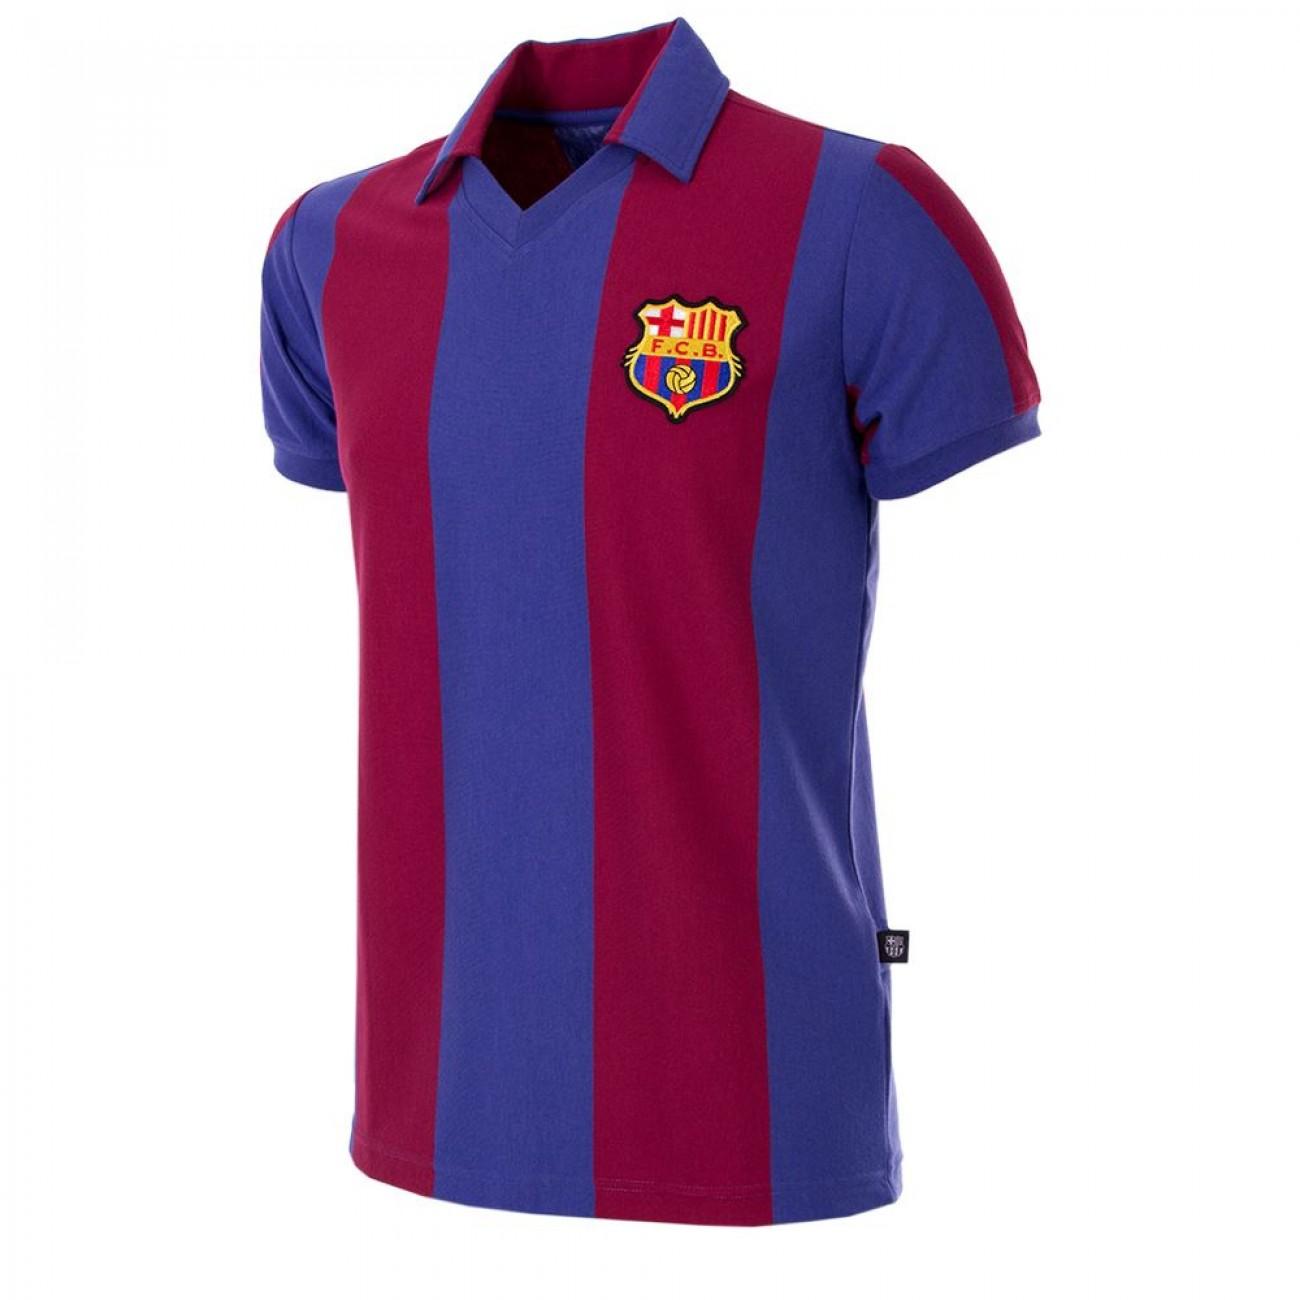 5b54f223245b0 Camiseta Antigua FC Barcelona años 80